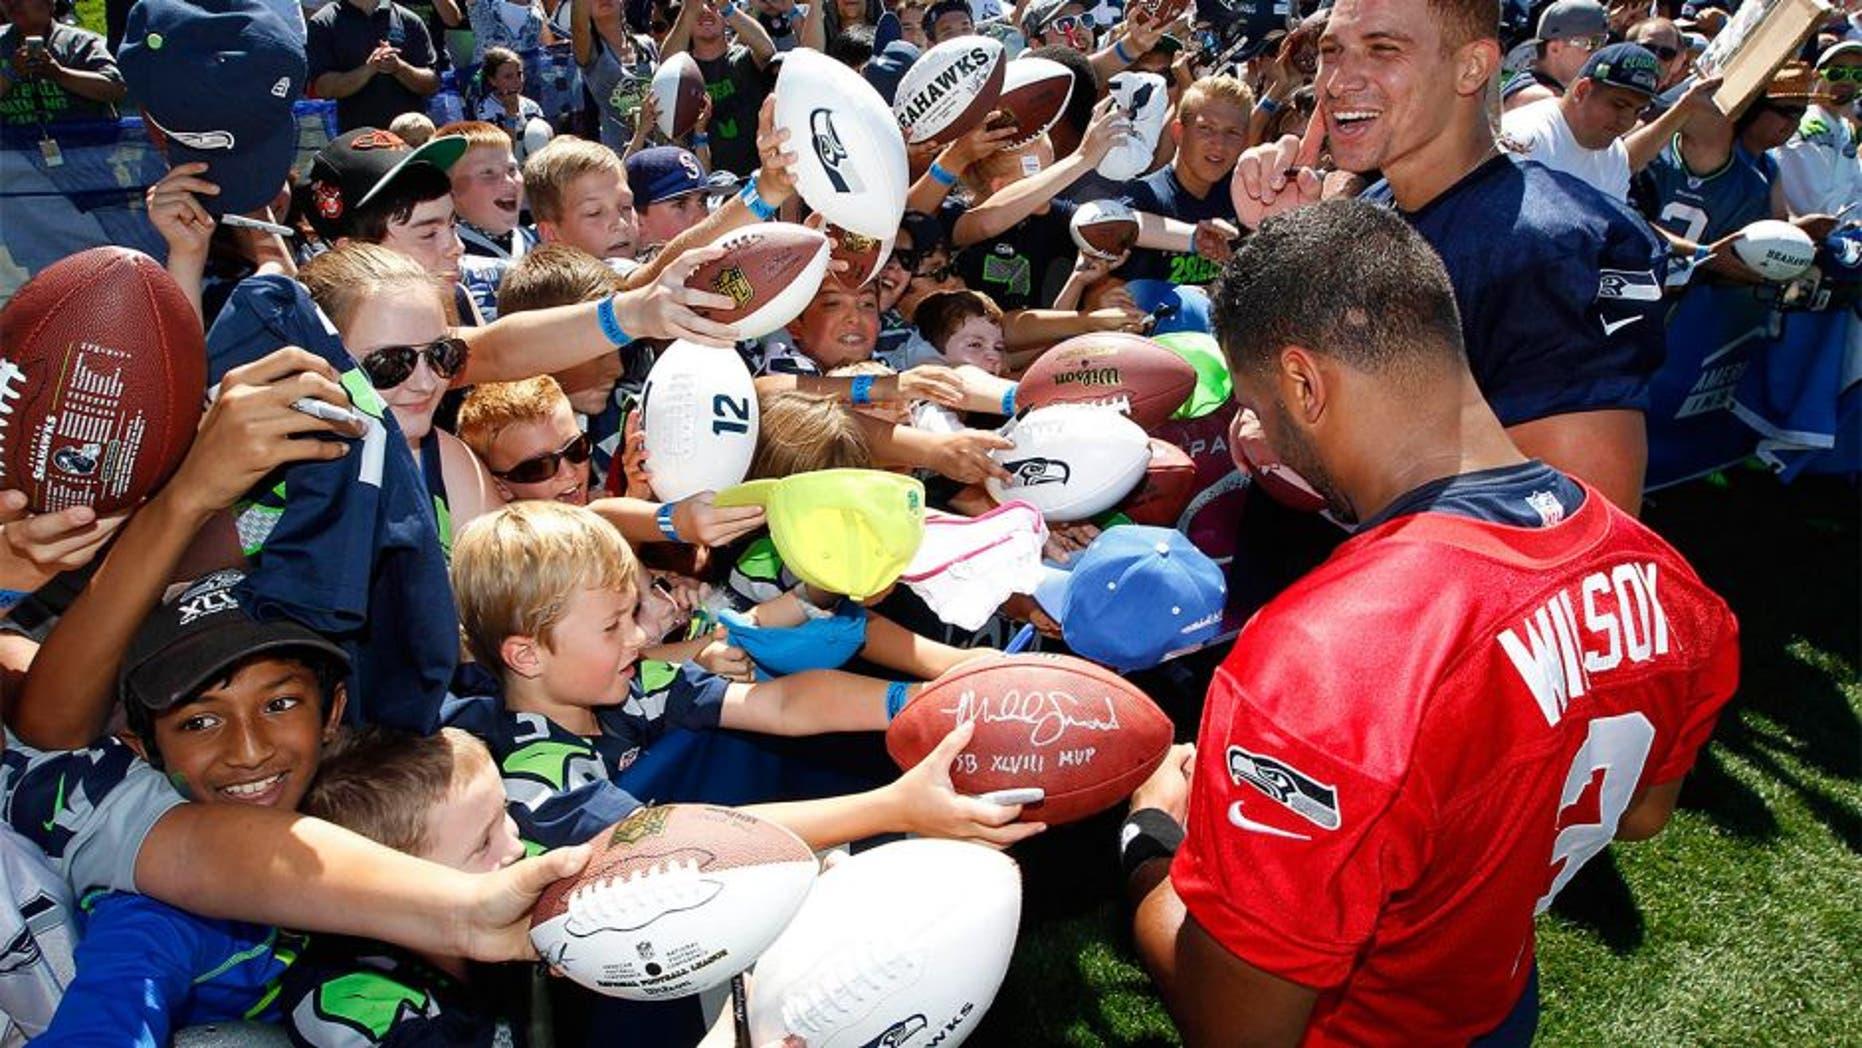 Jul 31, 2015; Renton, WA, USA; Seattle Seahawks quarterback Russell Wilson (3) and tight end Jimmy Graham (88) sign autographs following training camp practice at Virginia Mason Athletic Center. Mandatory Credit: Joe Nicholson-USA TODAY Sports